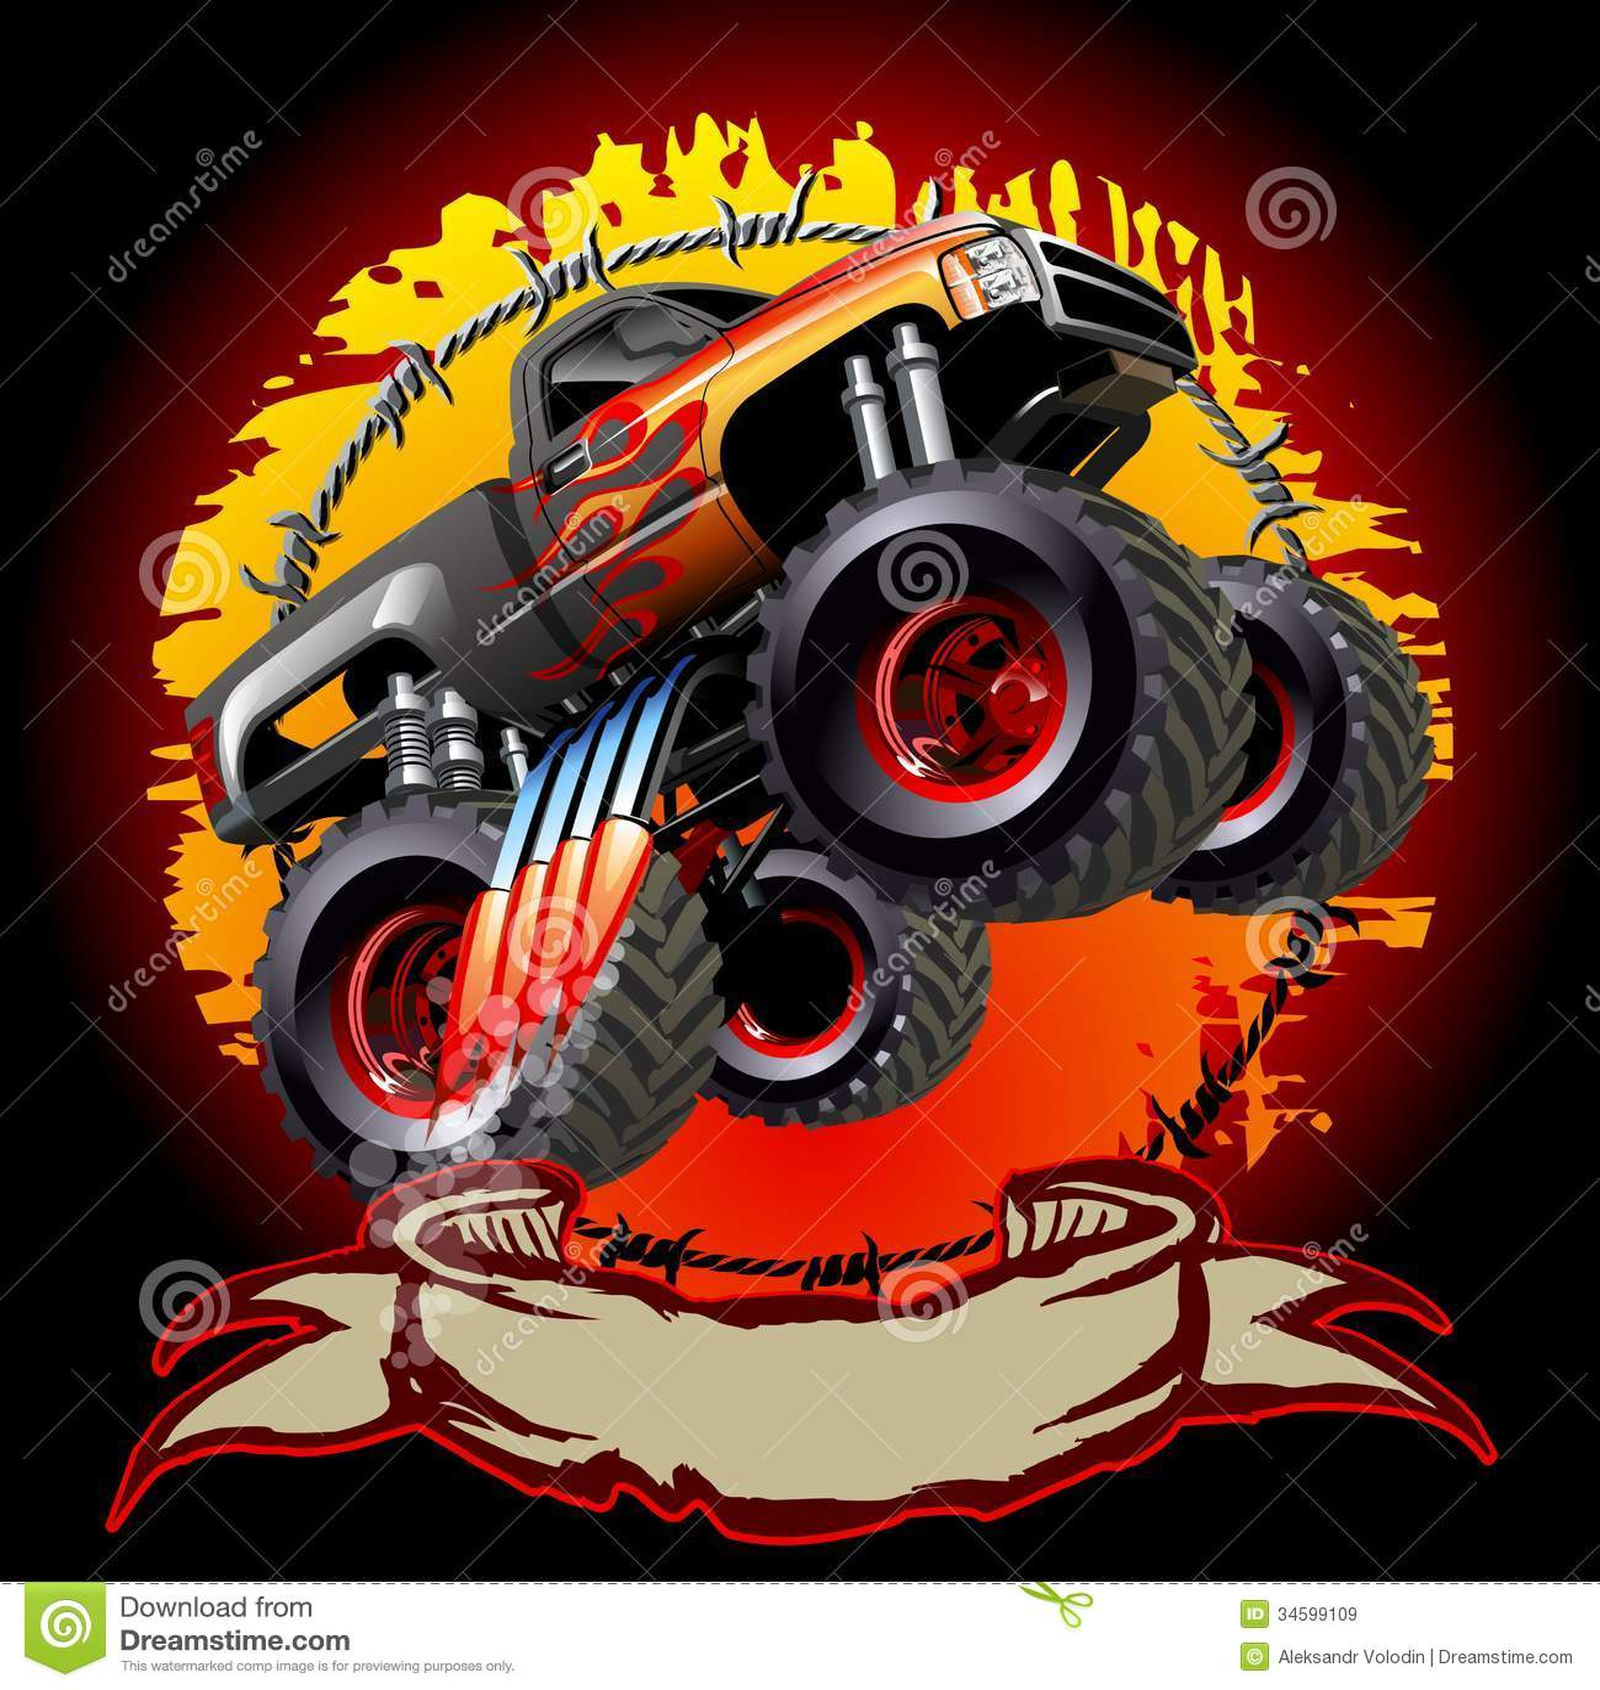 Cartoon Monster Truck Stock Illustrations 1 396 Cartoon Monster Truck Stock Illustrations Vectors Clipart Dreamstime